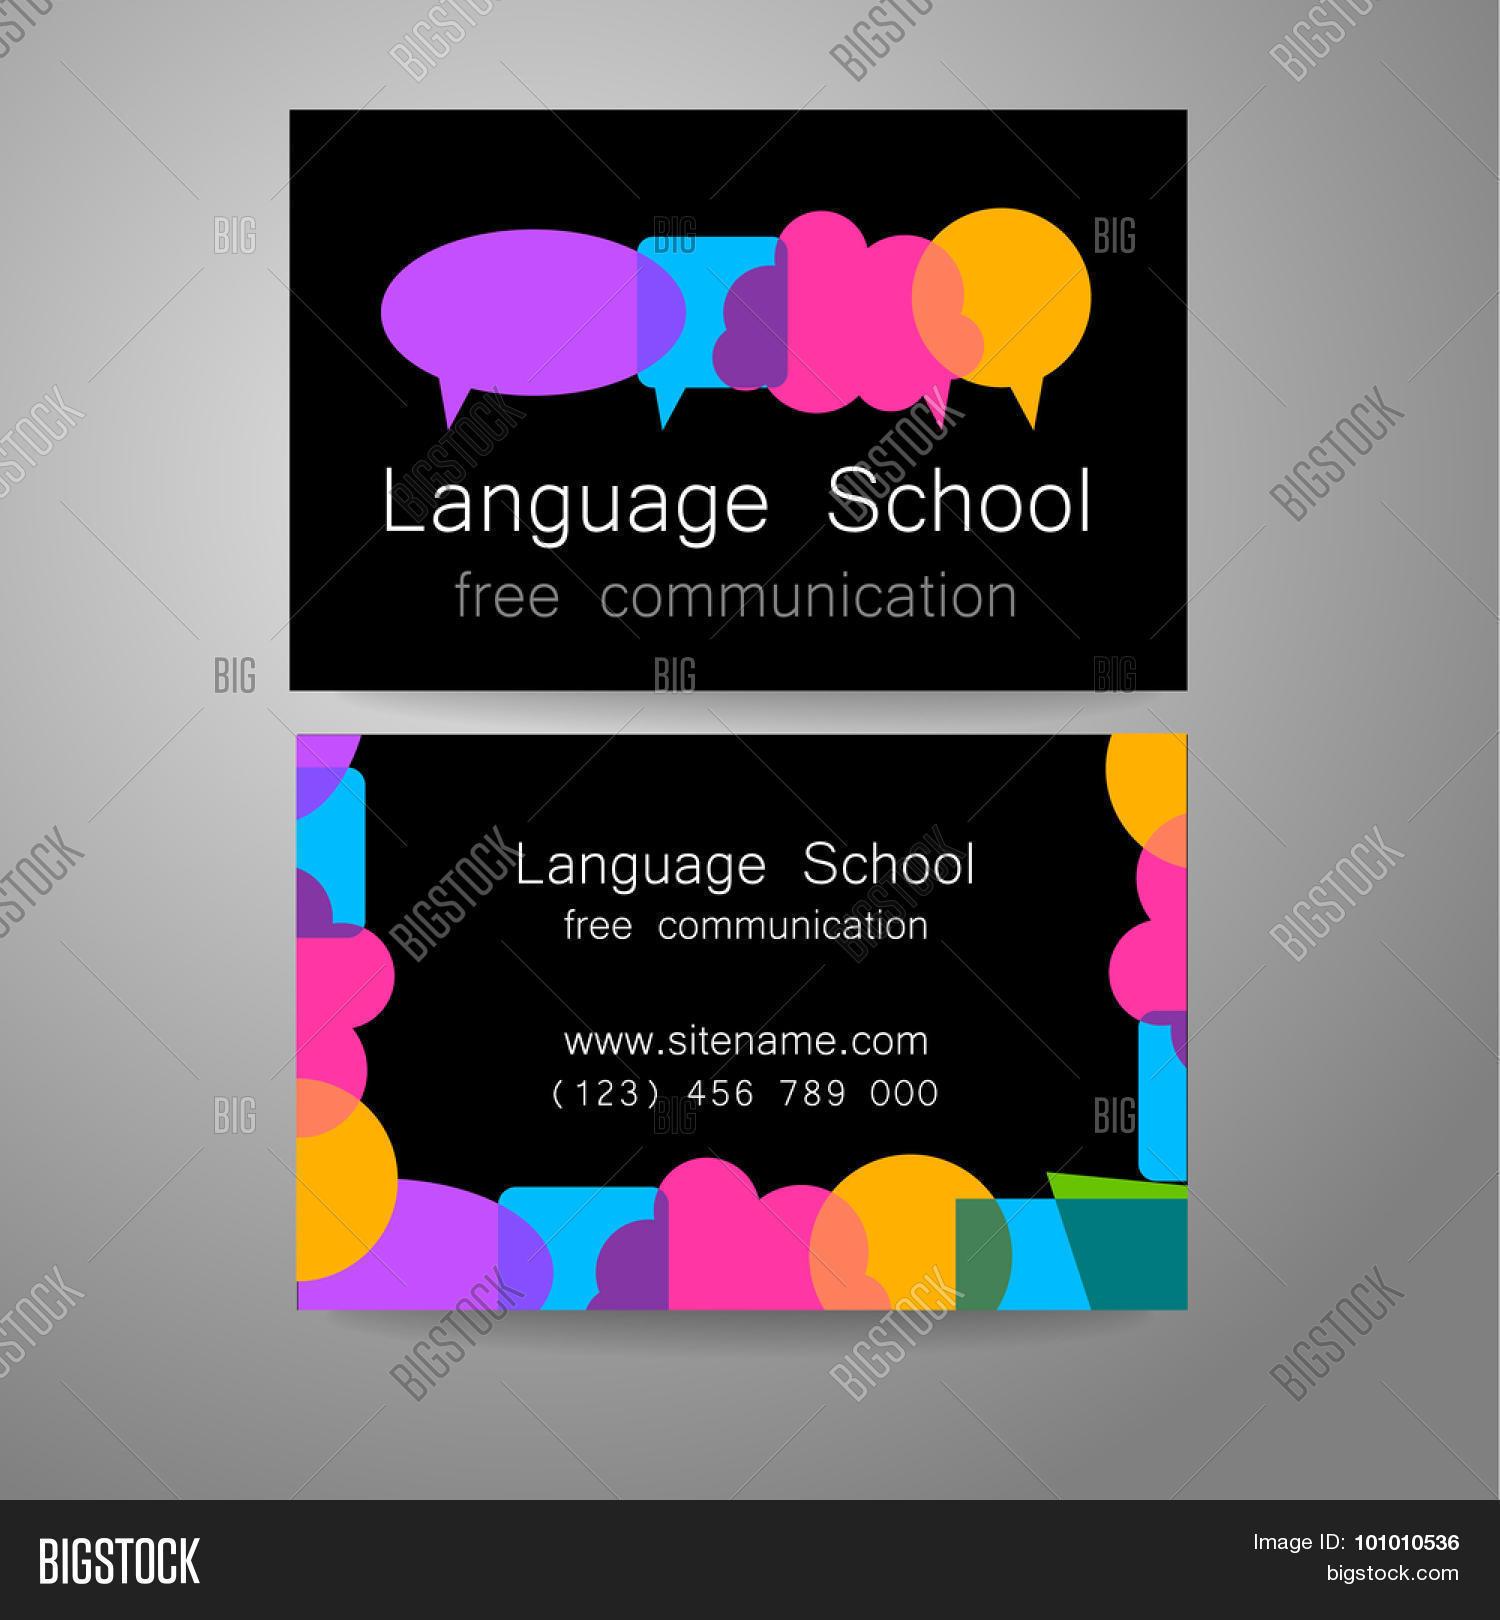 language school logo design vector photo